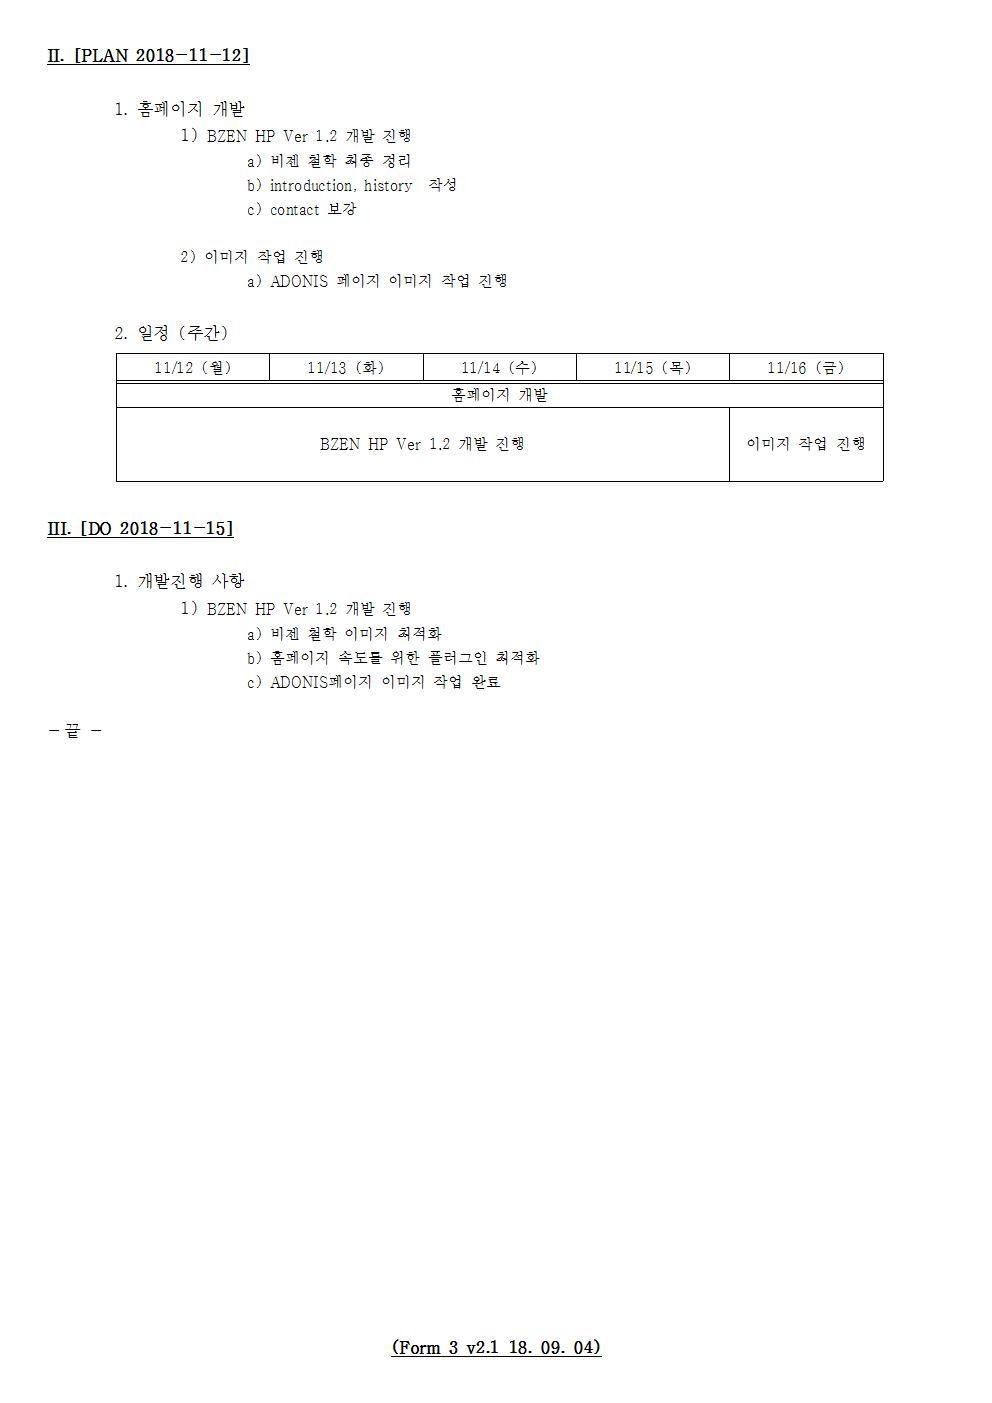 D-[18-047-BZ-07]-[BZEN HP v3.0]-[2018-11-15][HH]002.jpg